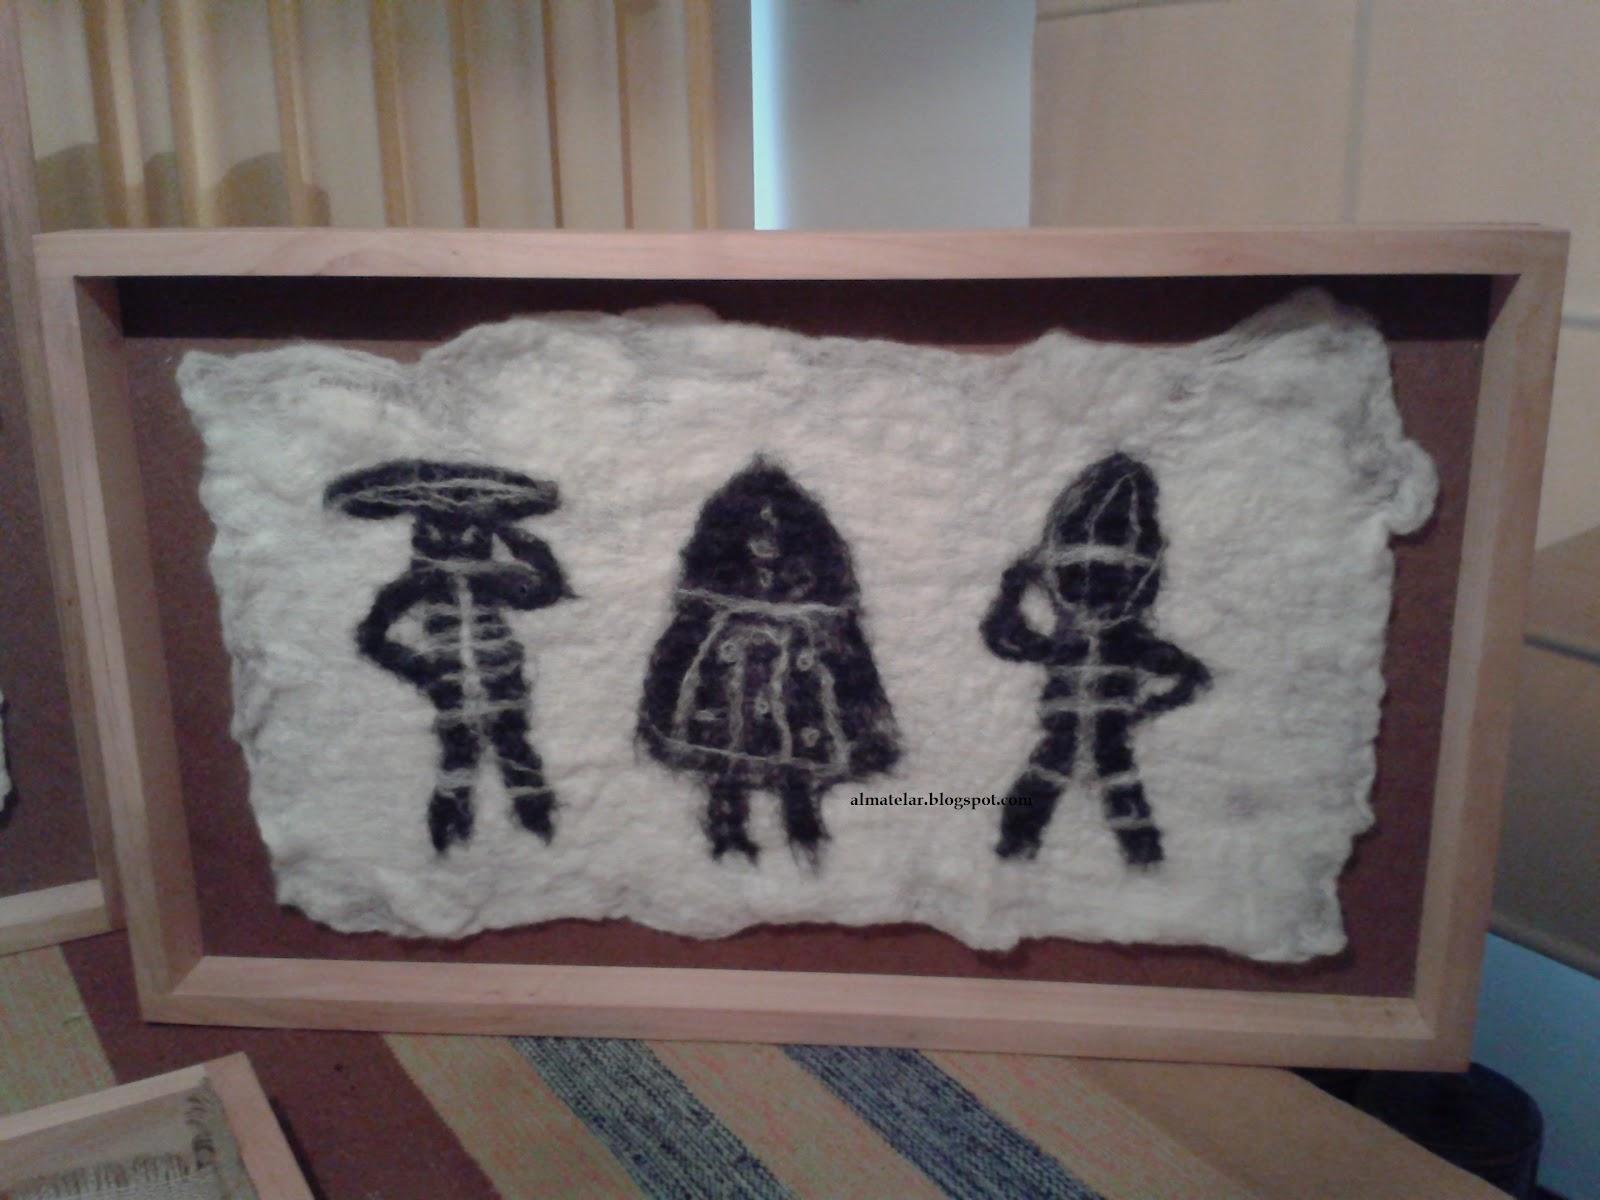 almatelar murales y tapices: Tapices enmarcados